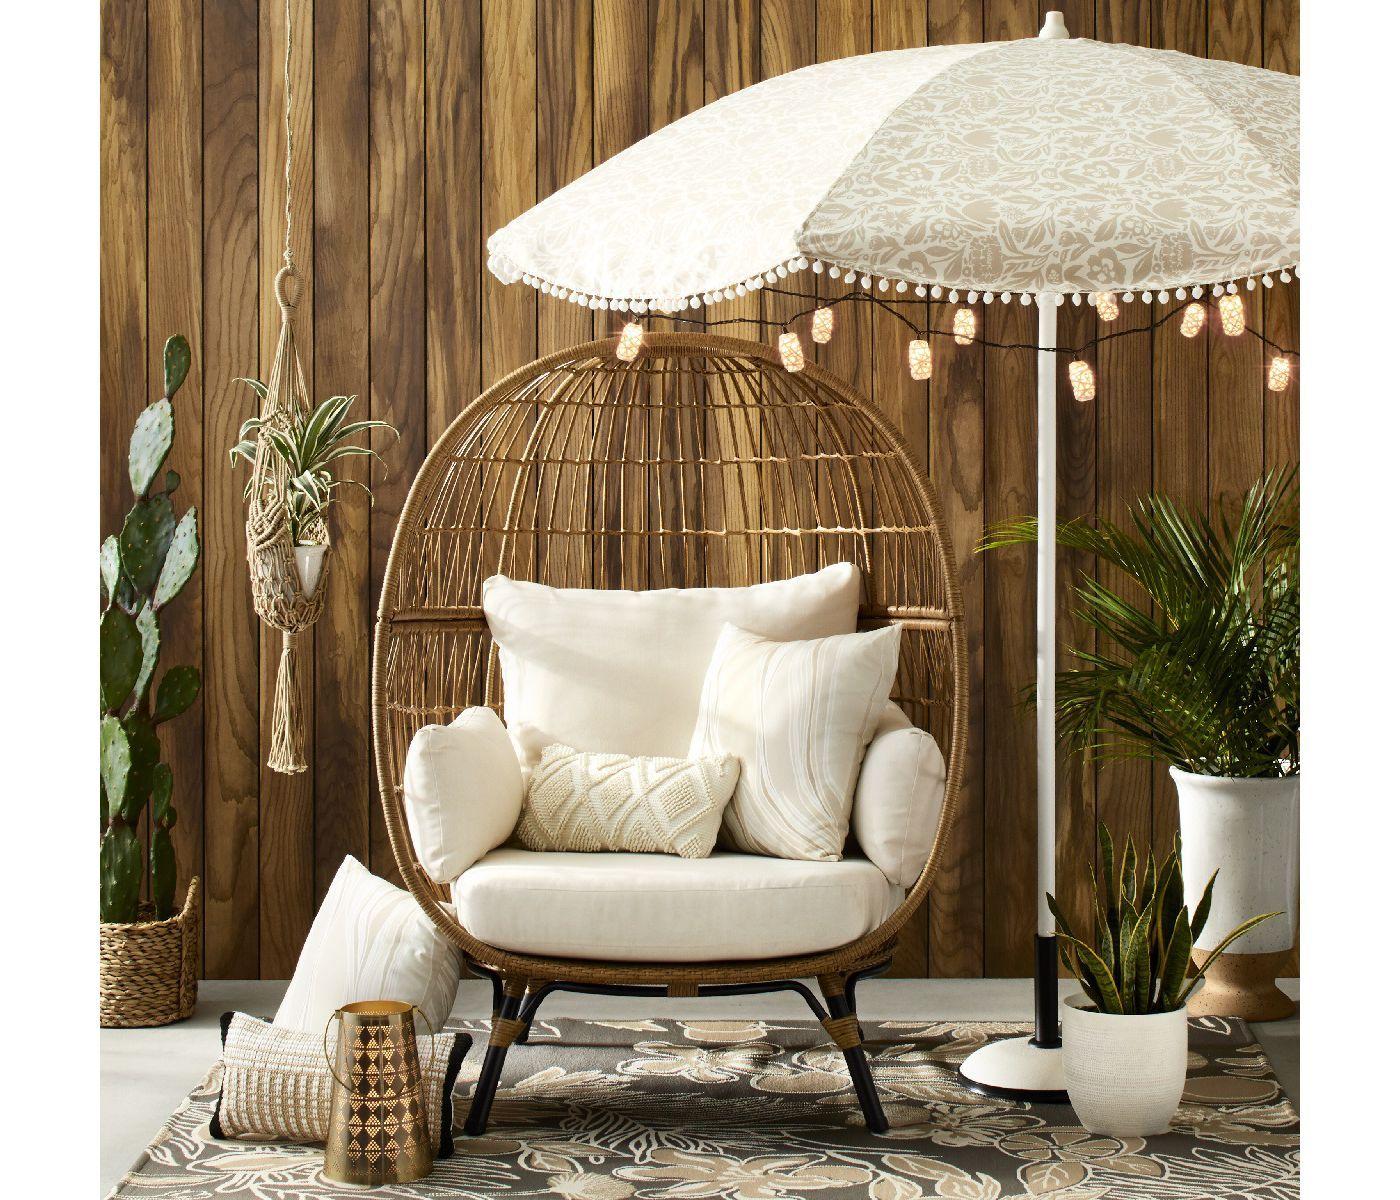 Download Wallpaper Target Outdoor Patio Egg Chair